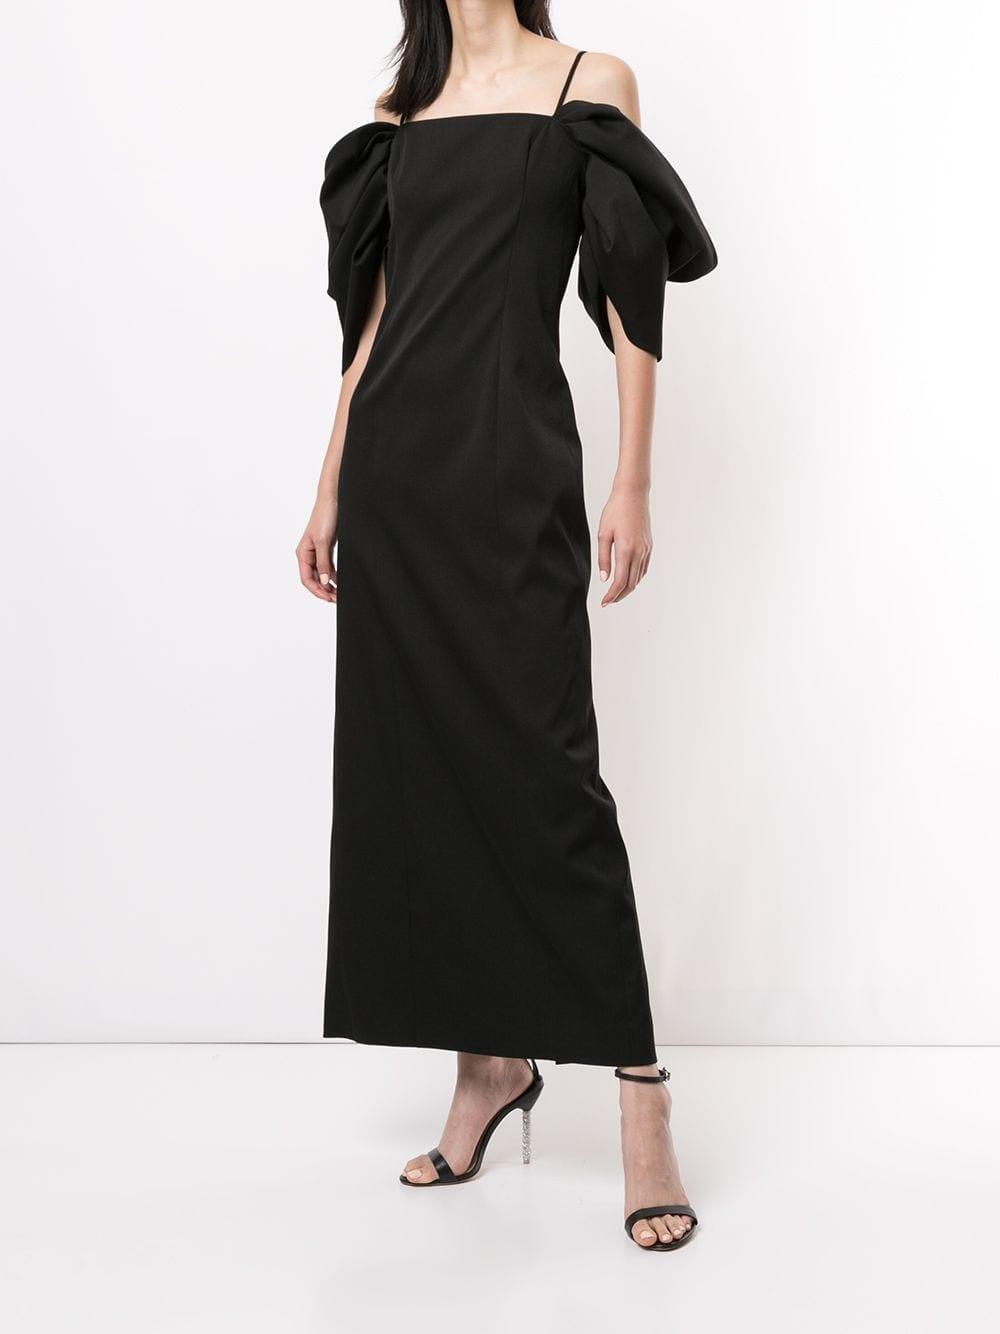 CAROLINA HERRERA Draped Puff Sleeves Dress 1